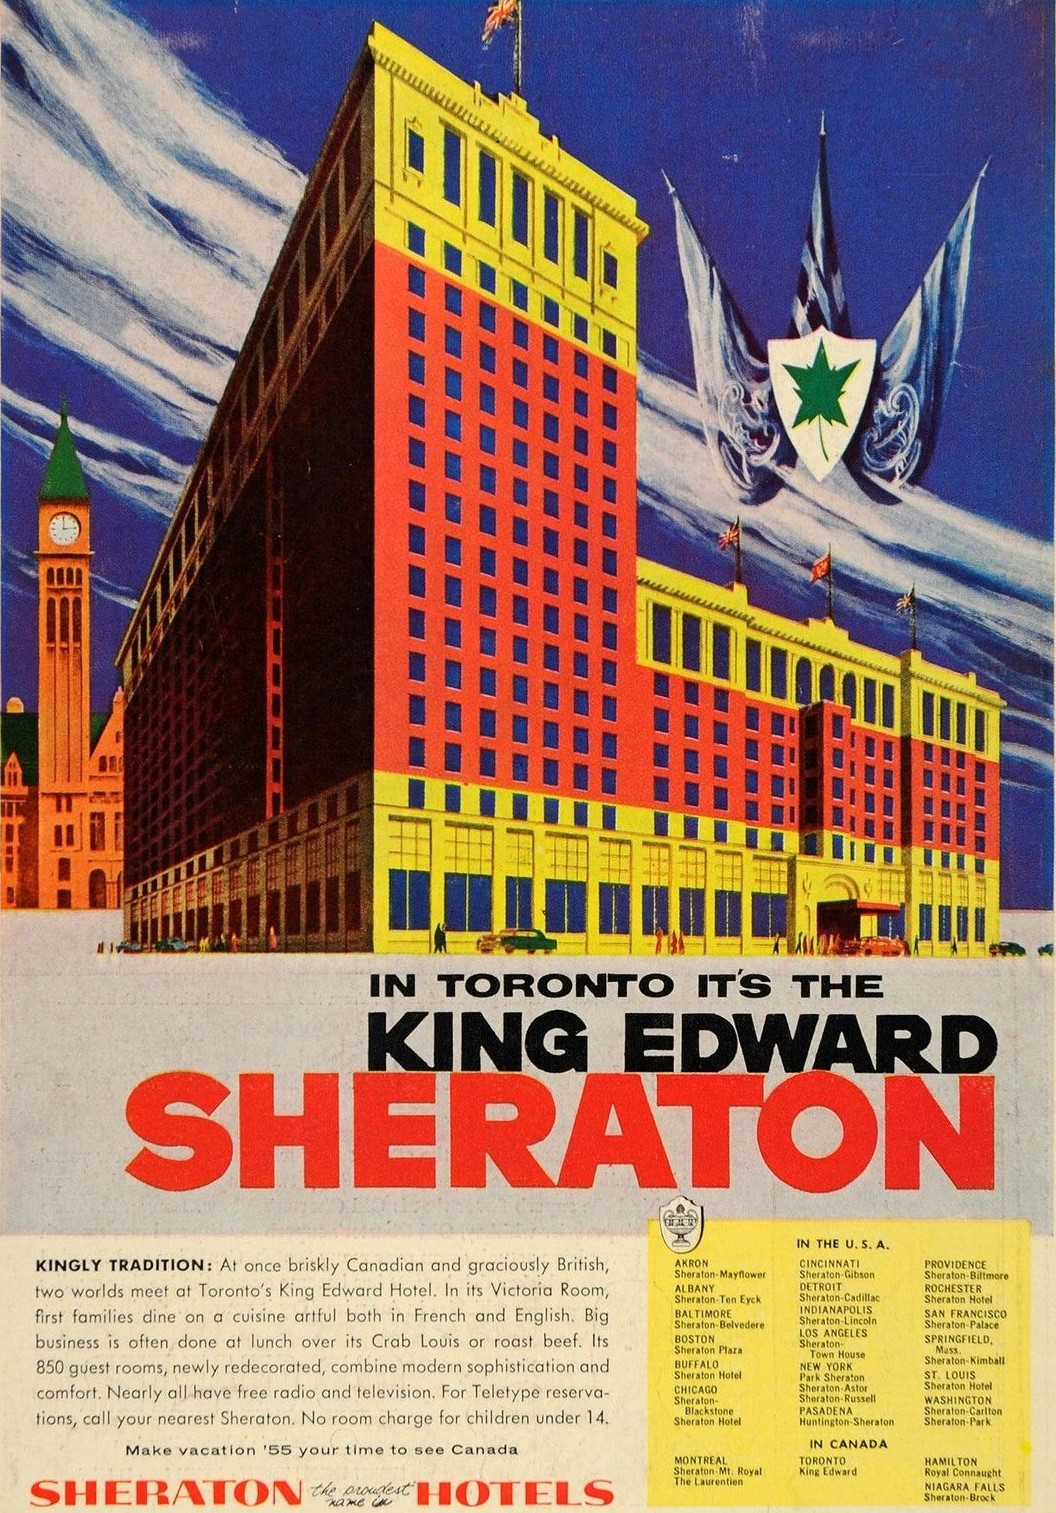 1955 - The Sheraton-King Edward in Toronto